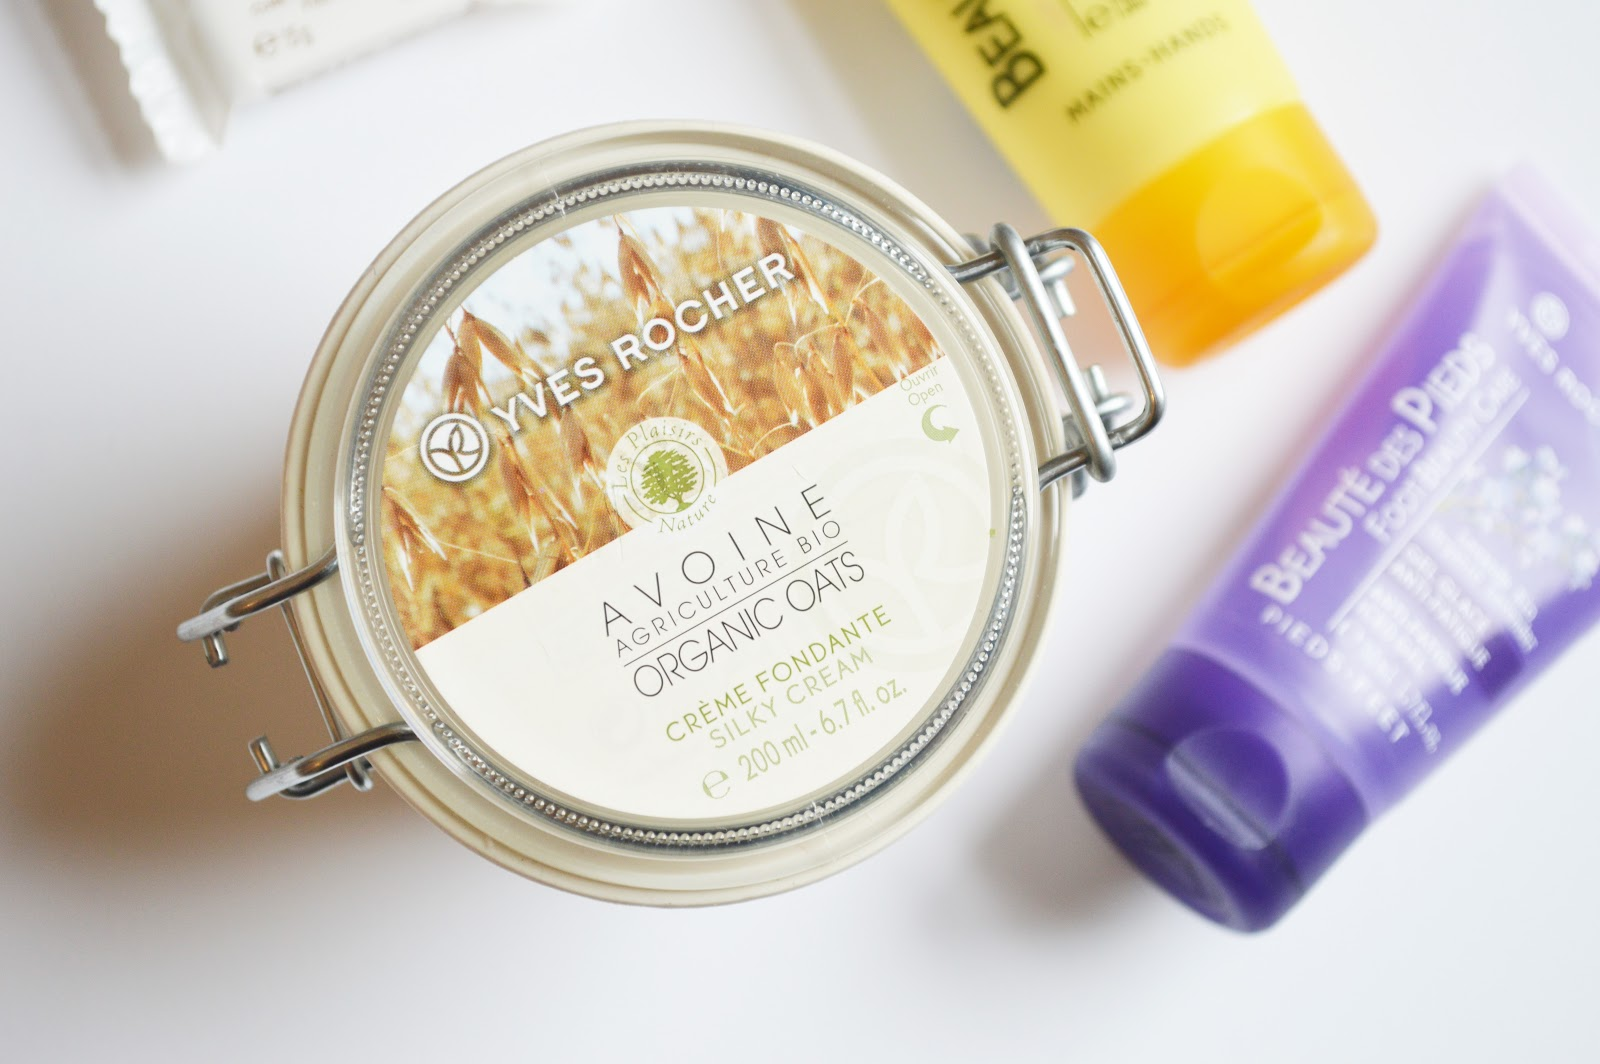 Yves Rocher Organic Oats Silky Cream